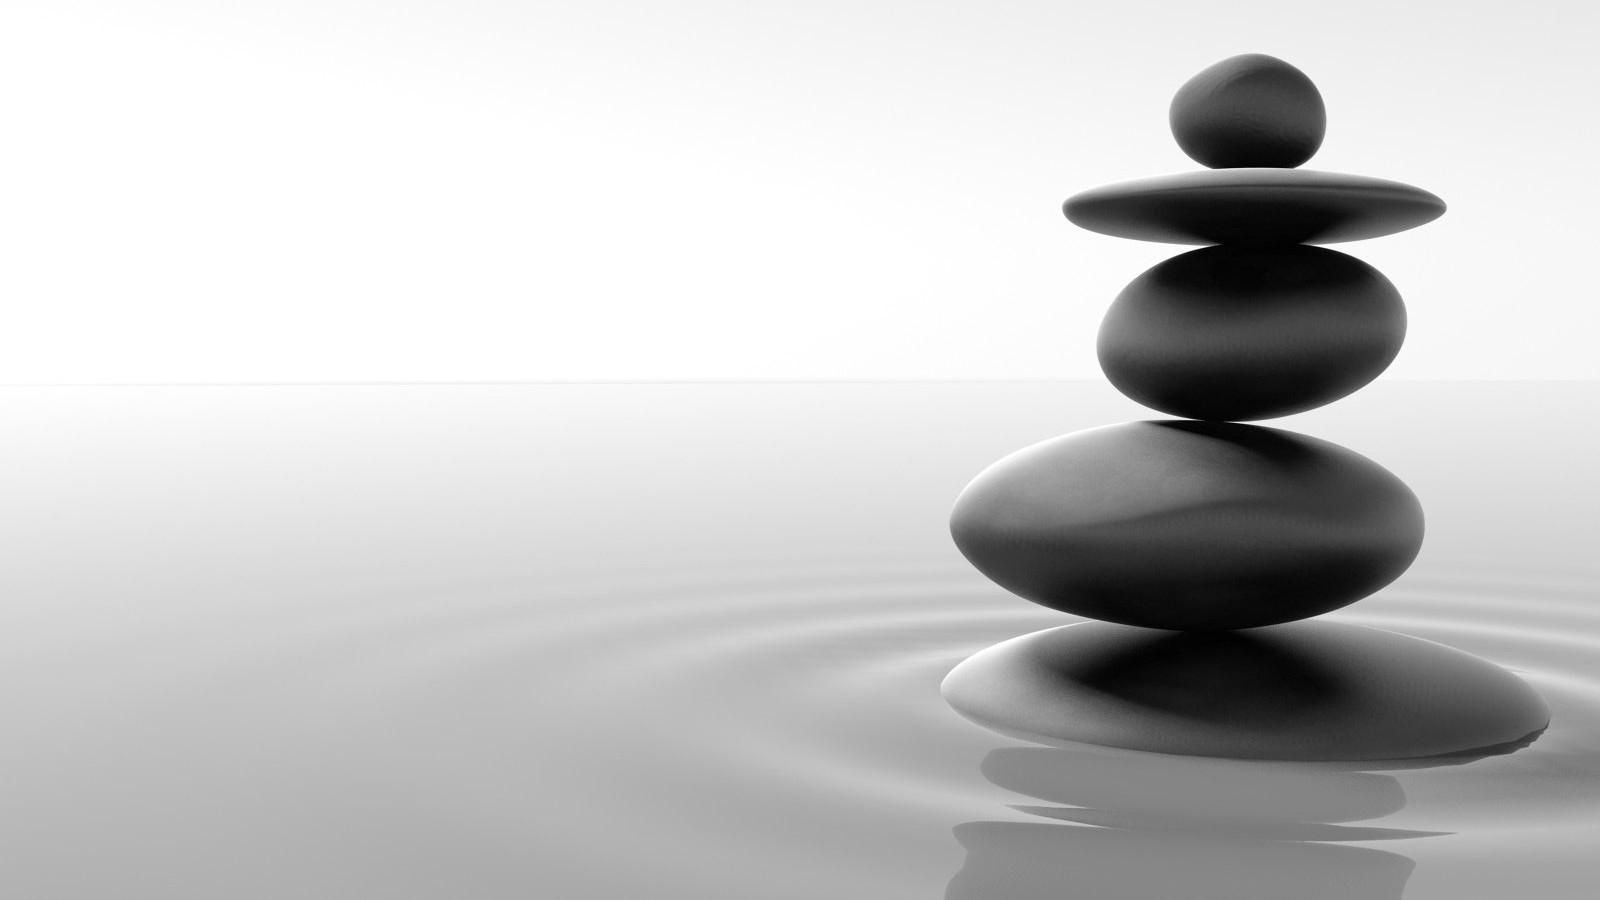 Download Zen Balance Wallpaper 1600x900 Wallpoper 384535 1600x900